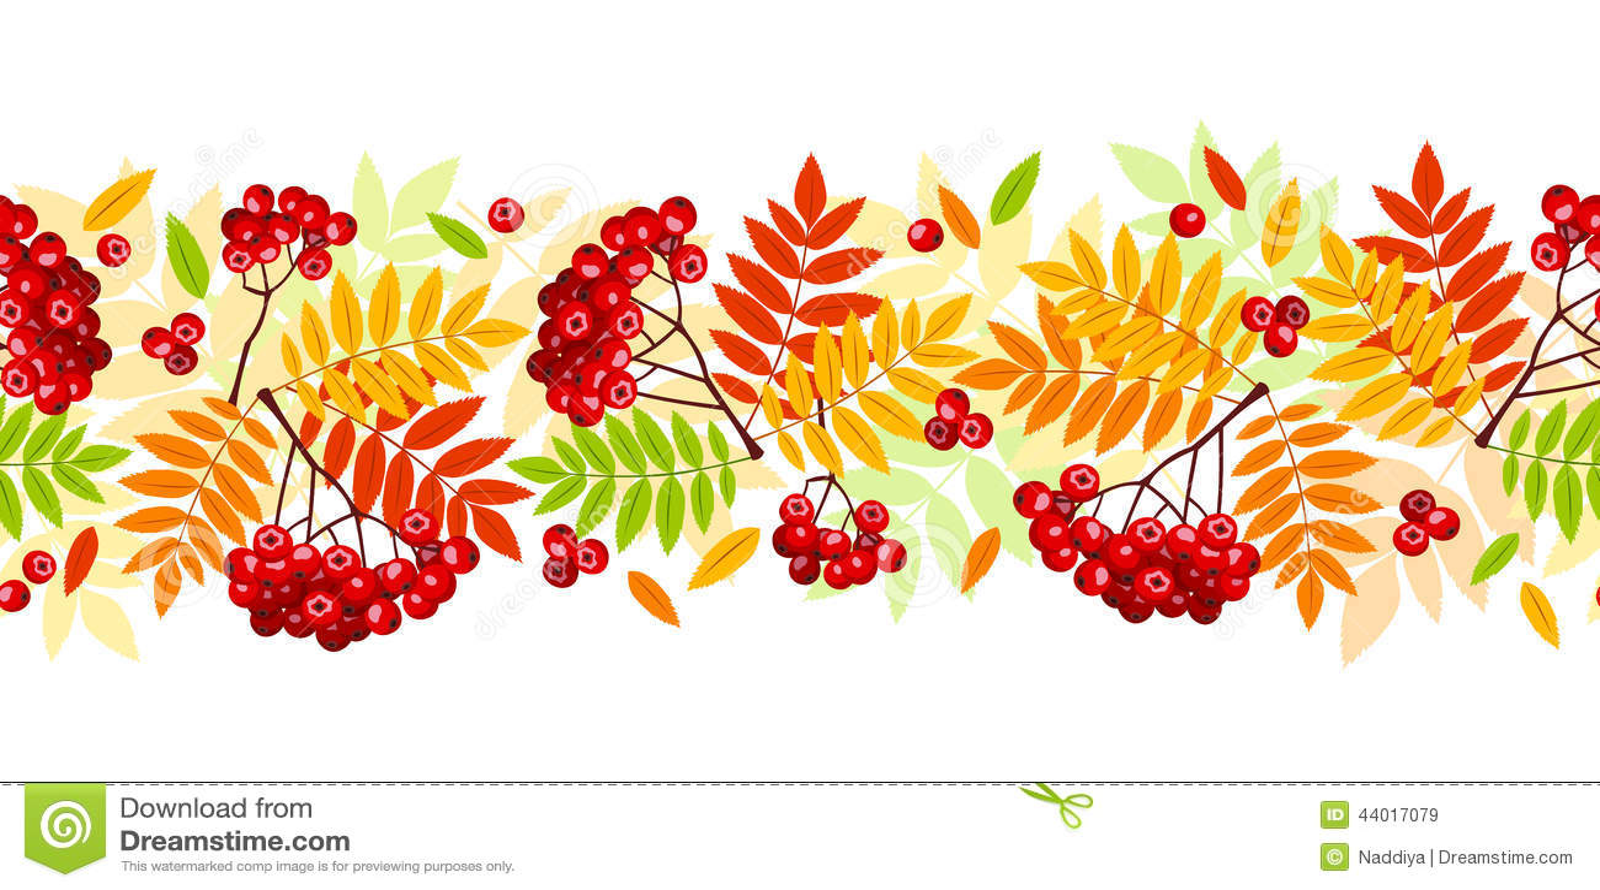 Horizontal Seamless Background With Autumn Rowan Branches